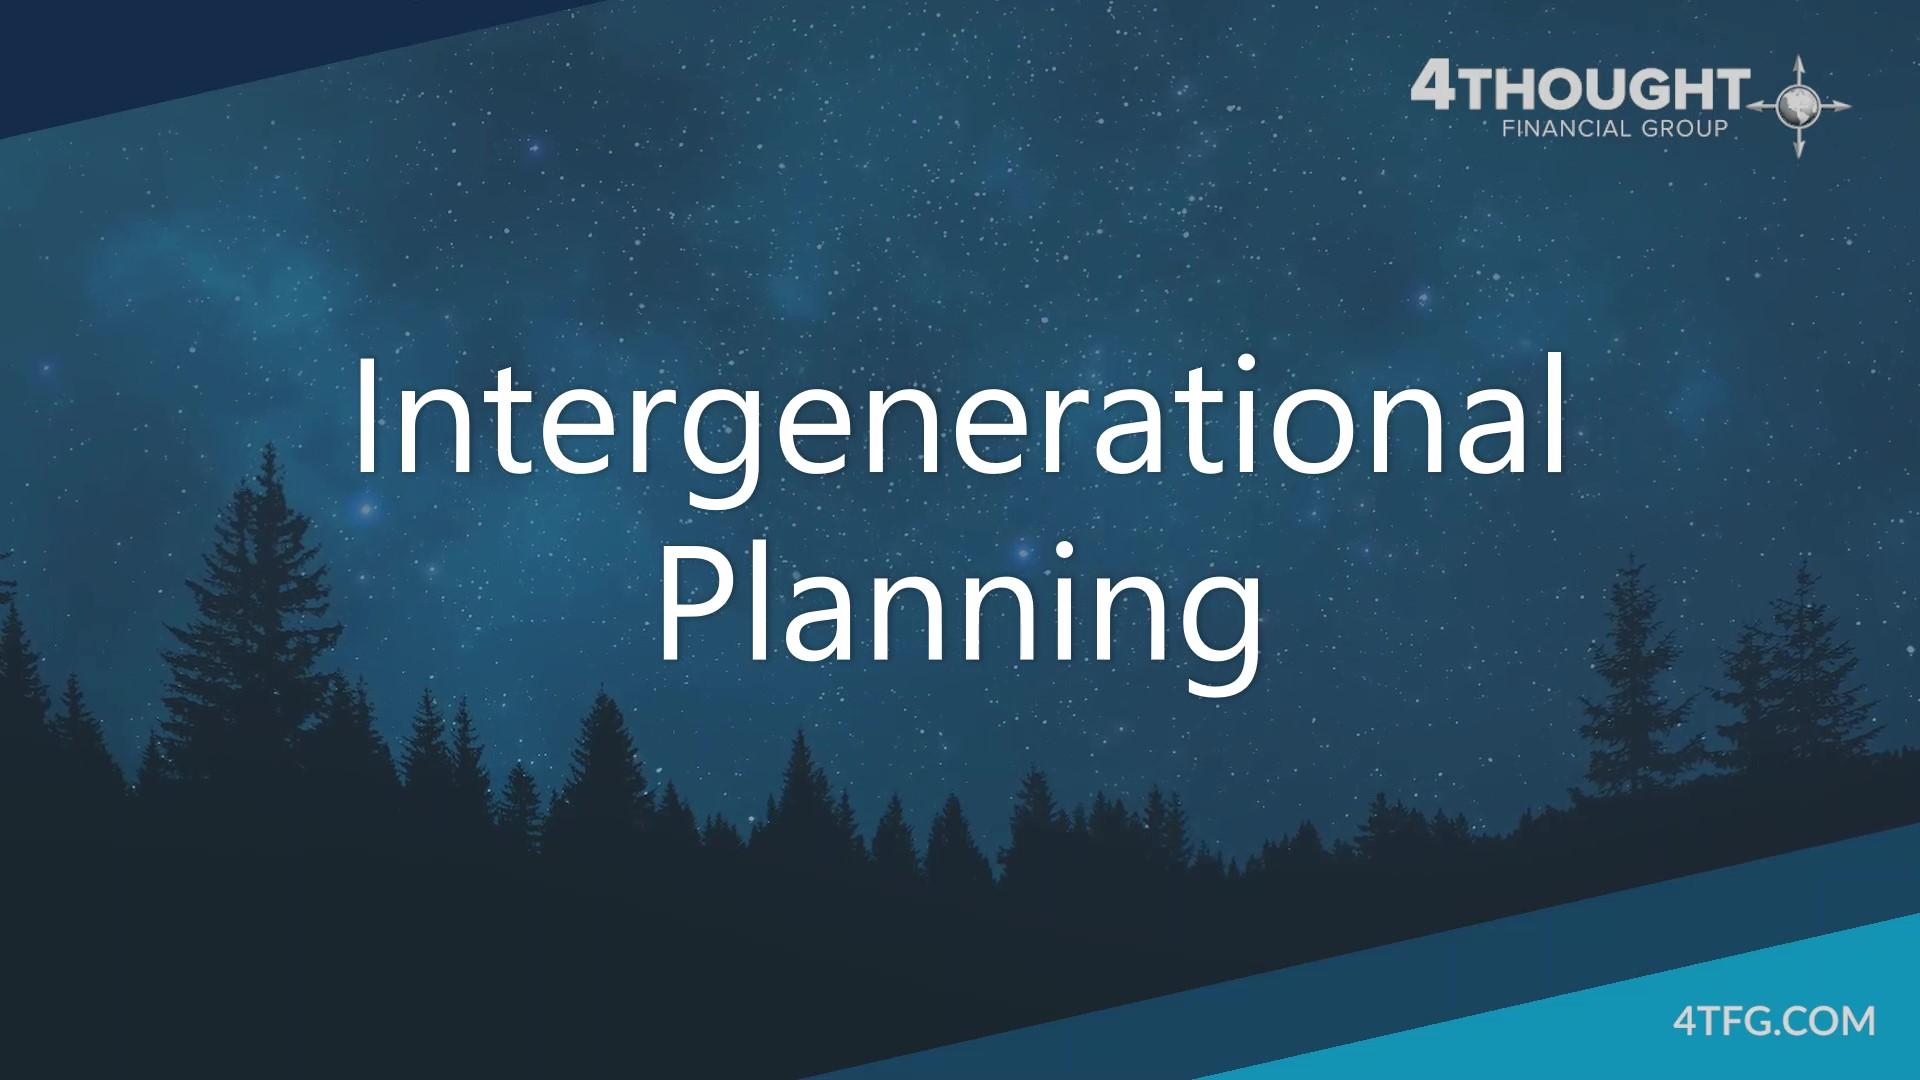 Intergenerational Planning